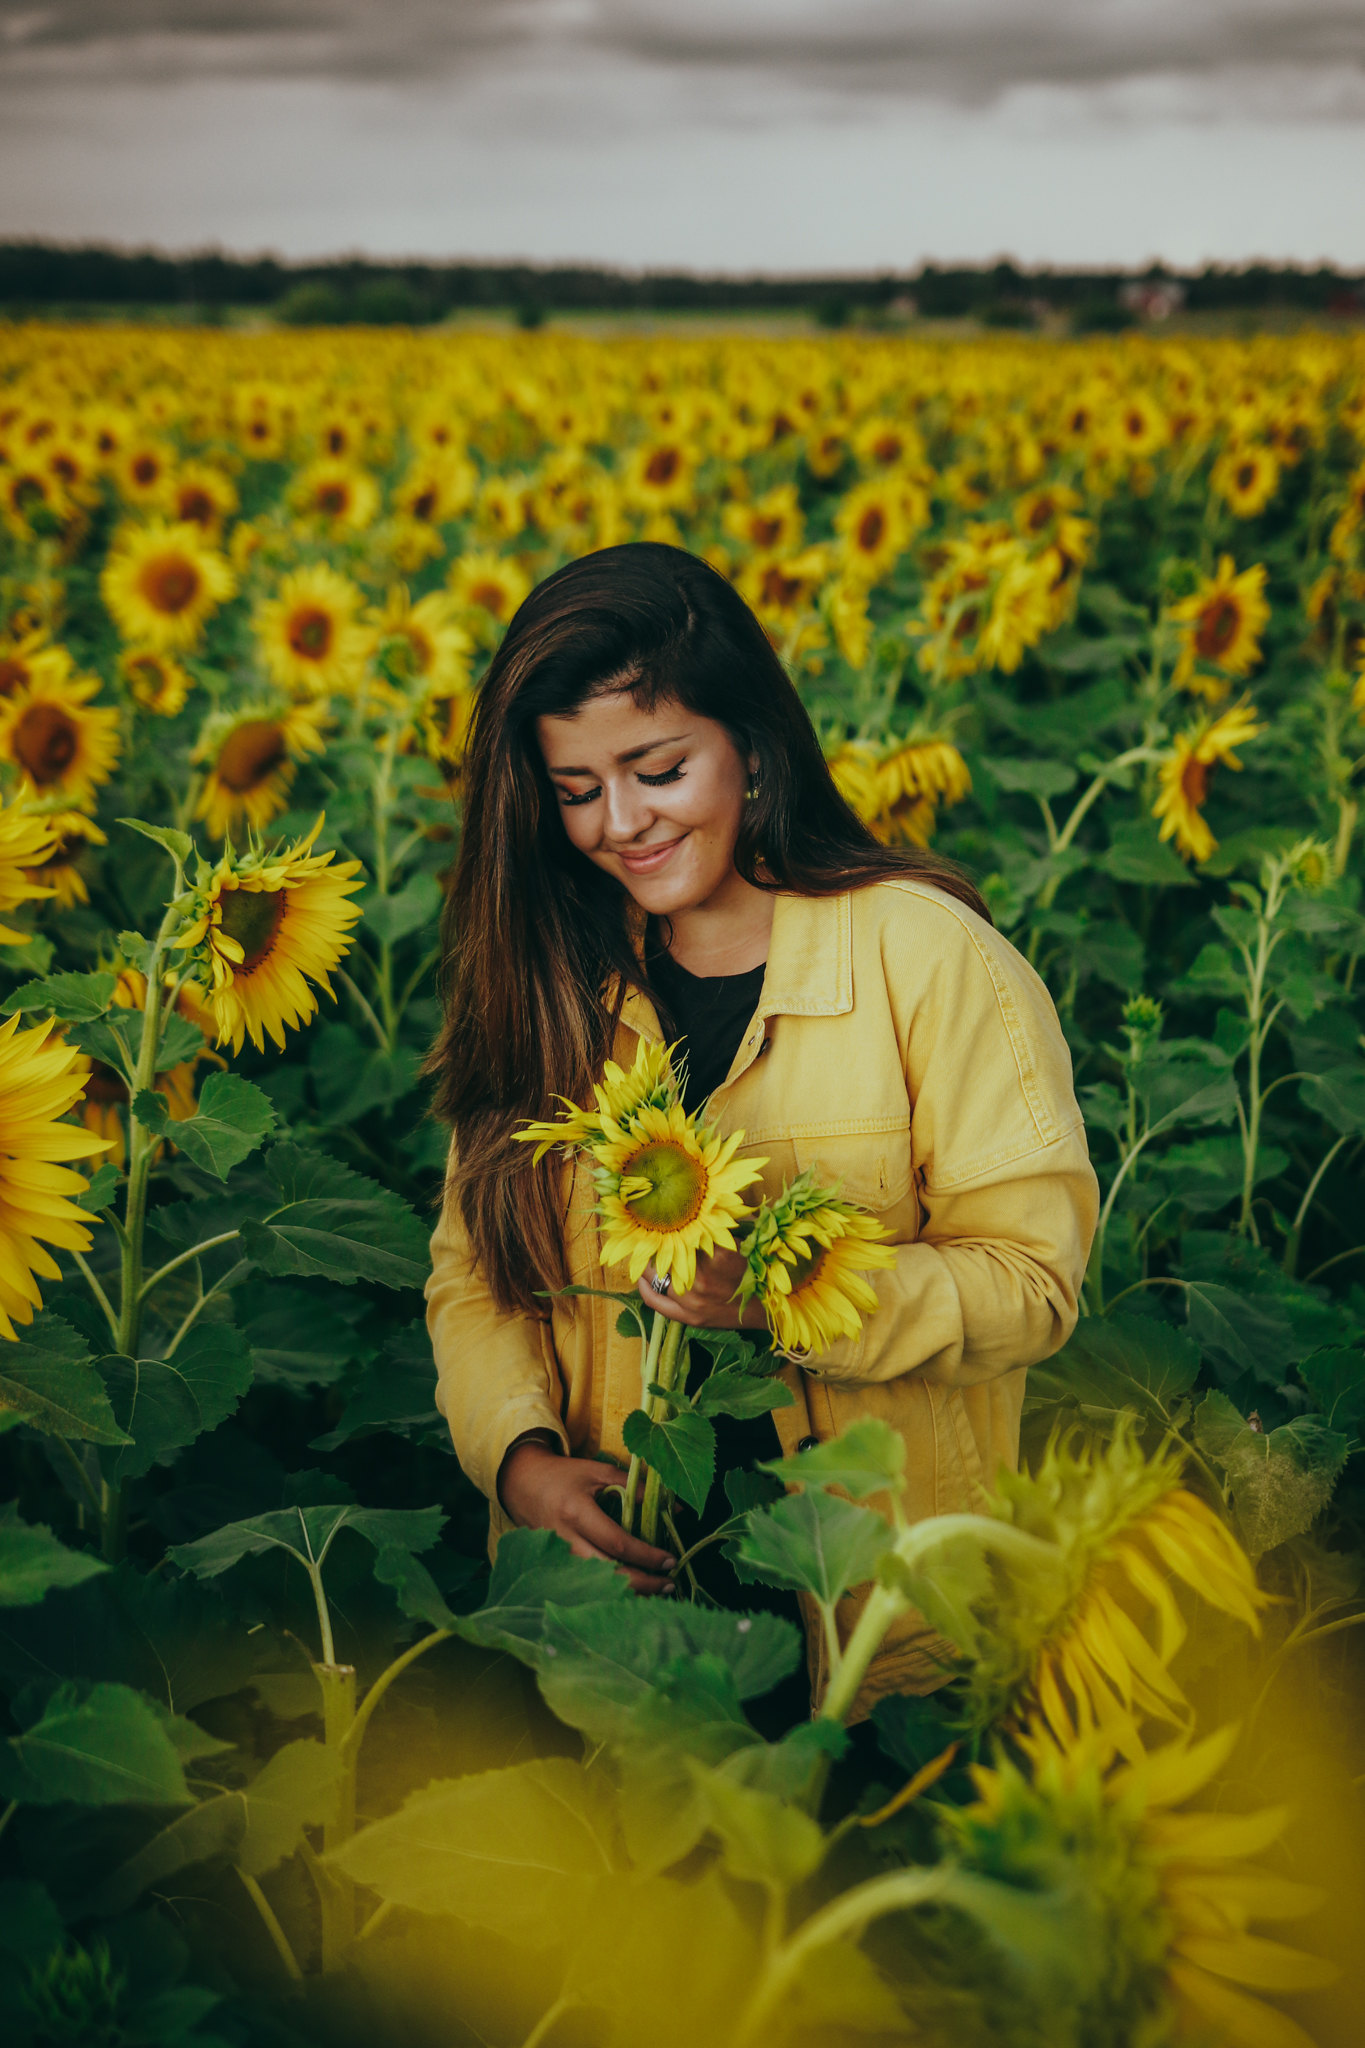 auringonkukkia-19